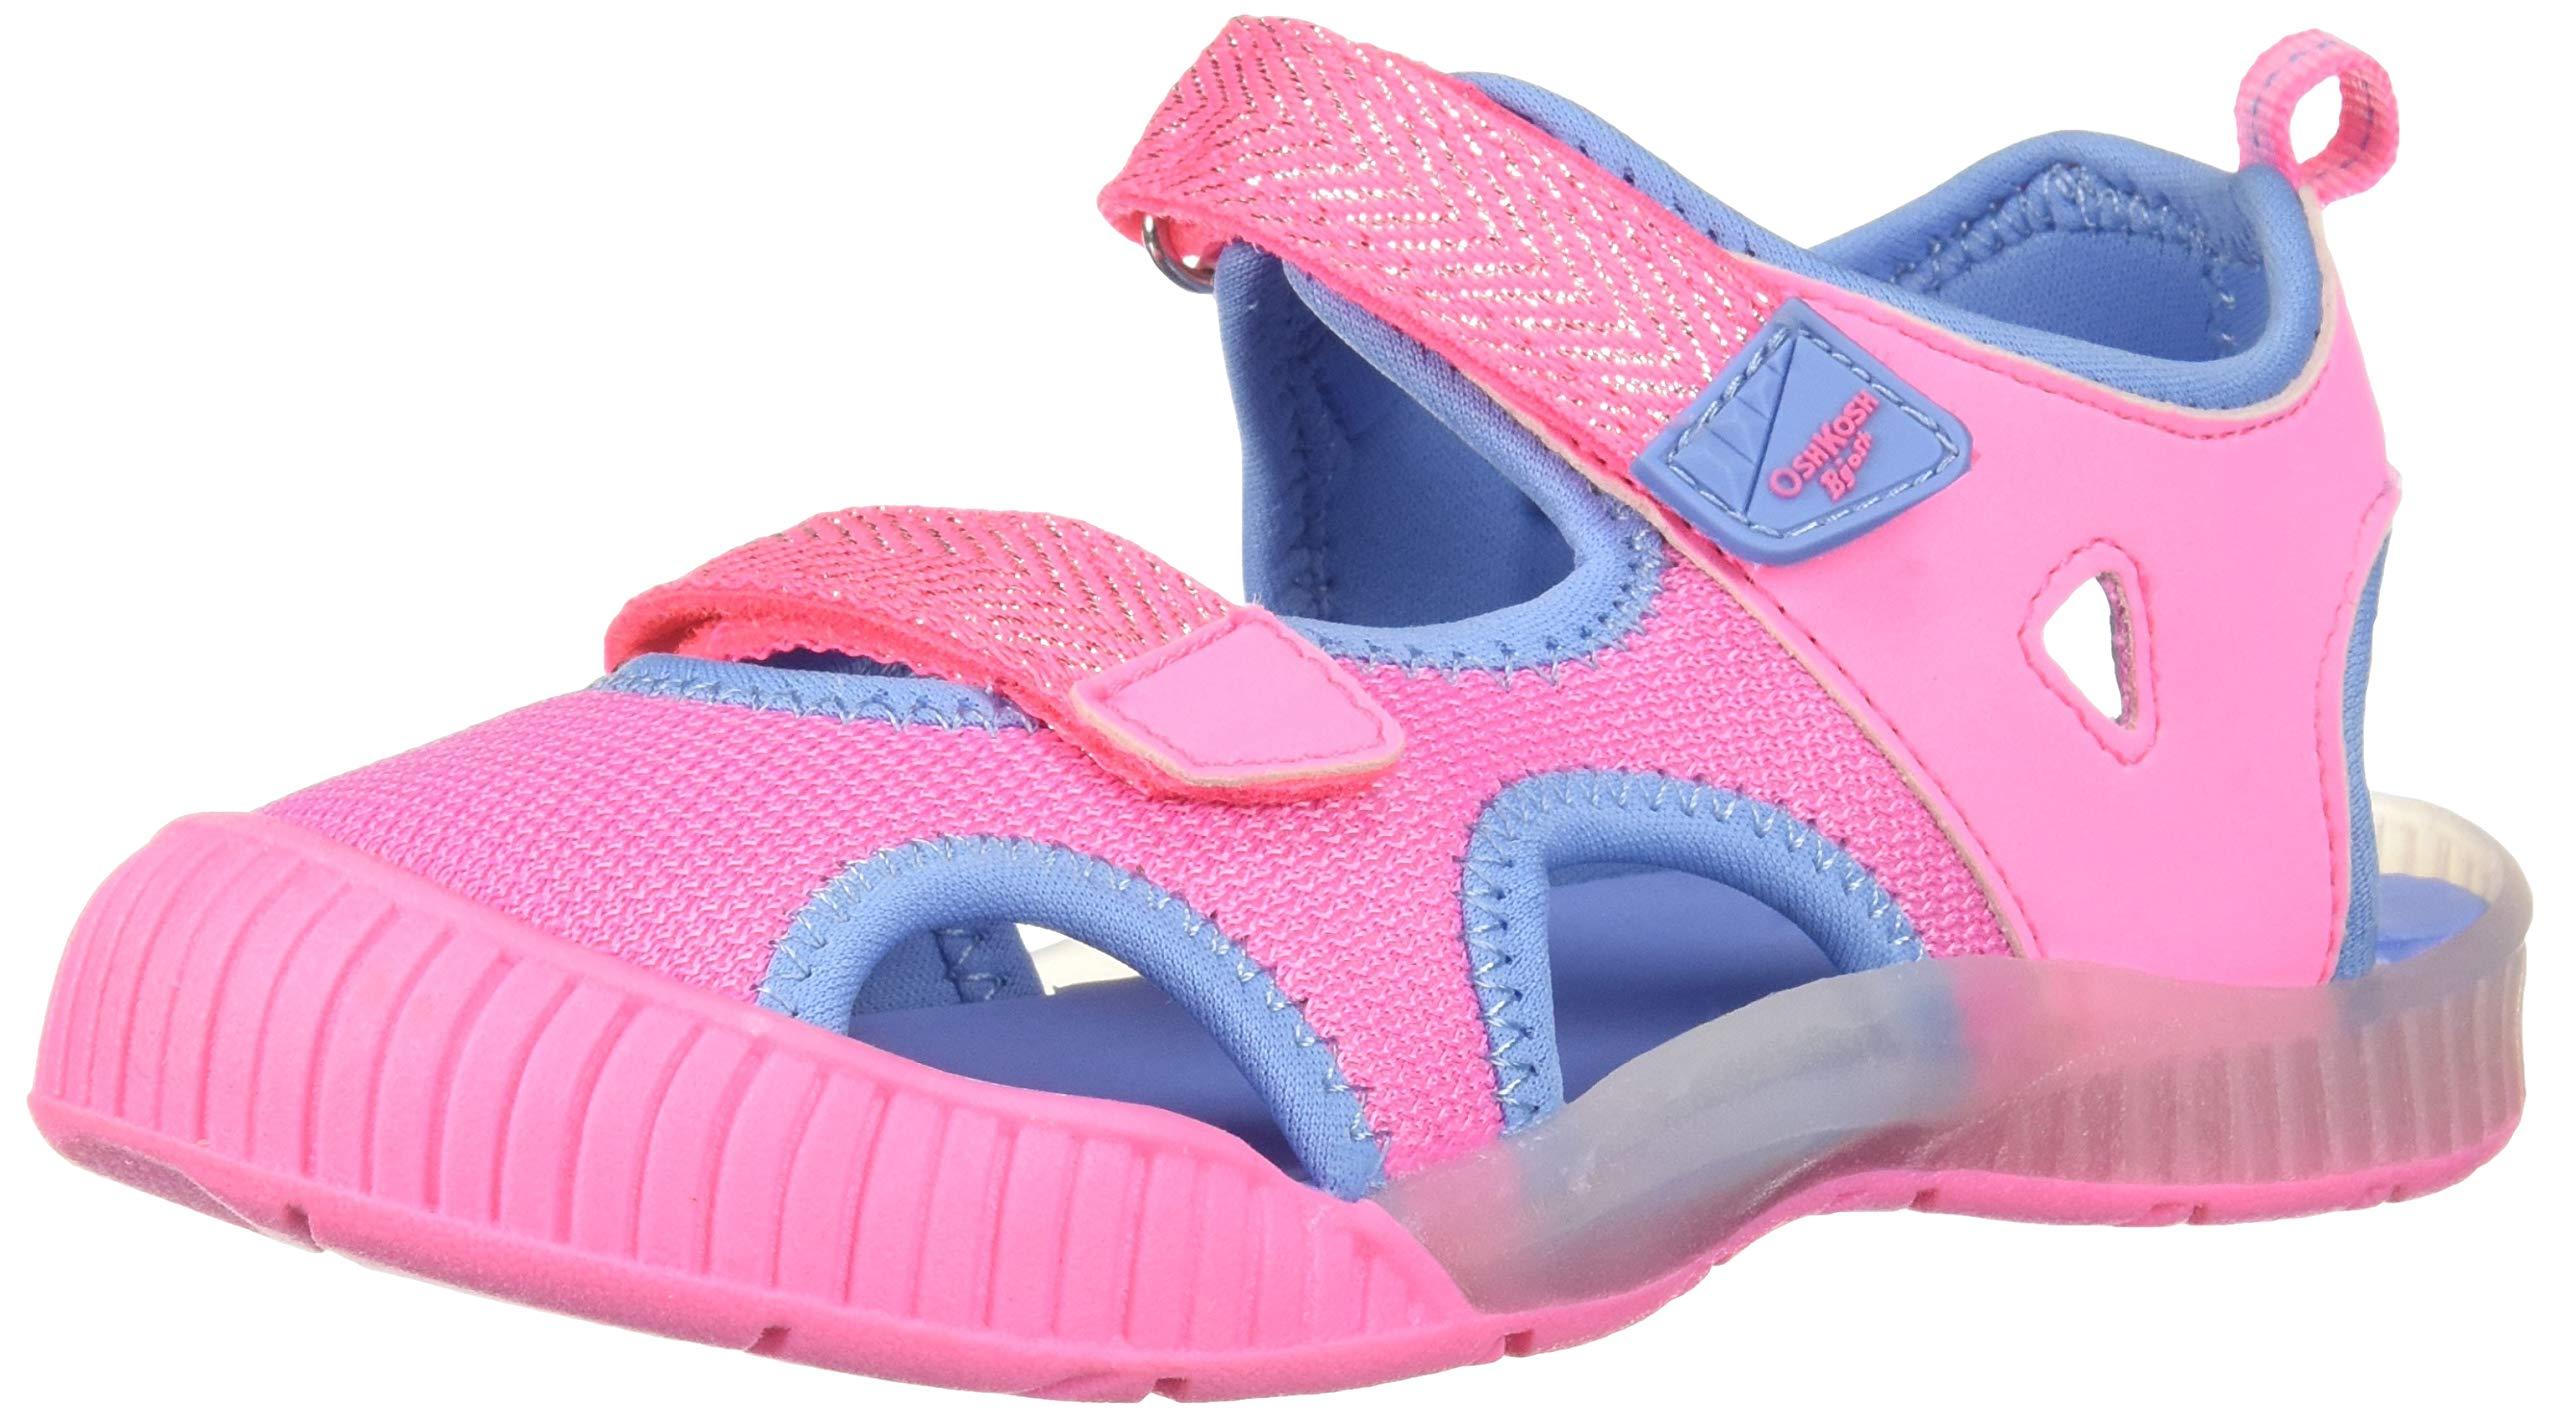 OshKosh B'Gosh Unisex-kids Zap Light-Up Athletic Sandal Sport, Pink, 11 M US Toddler